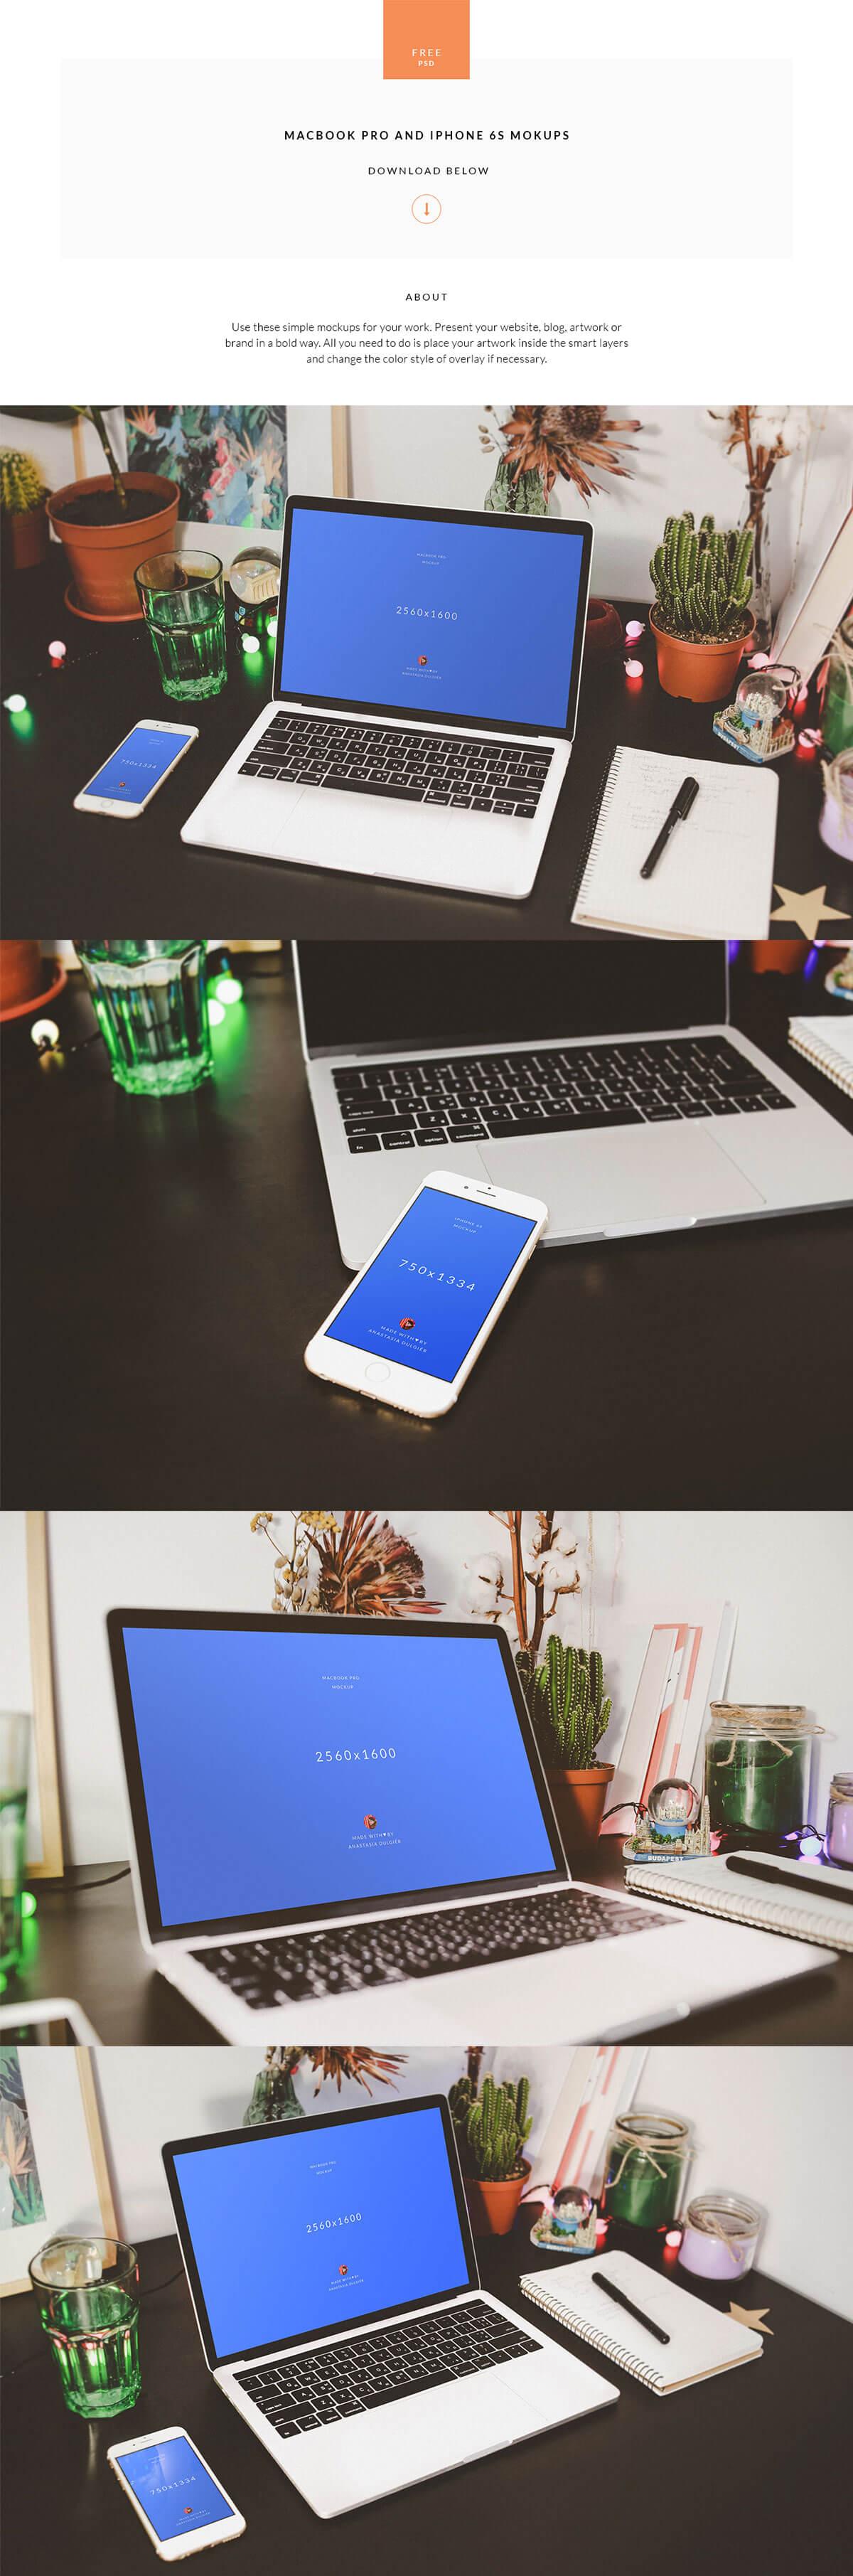 Free Macbook Pro Iphone 6S Mockups PSD